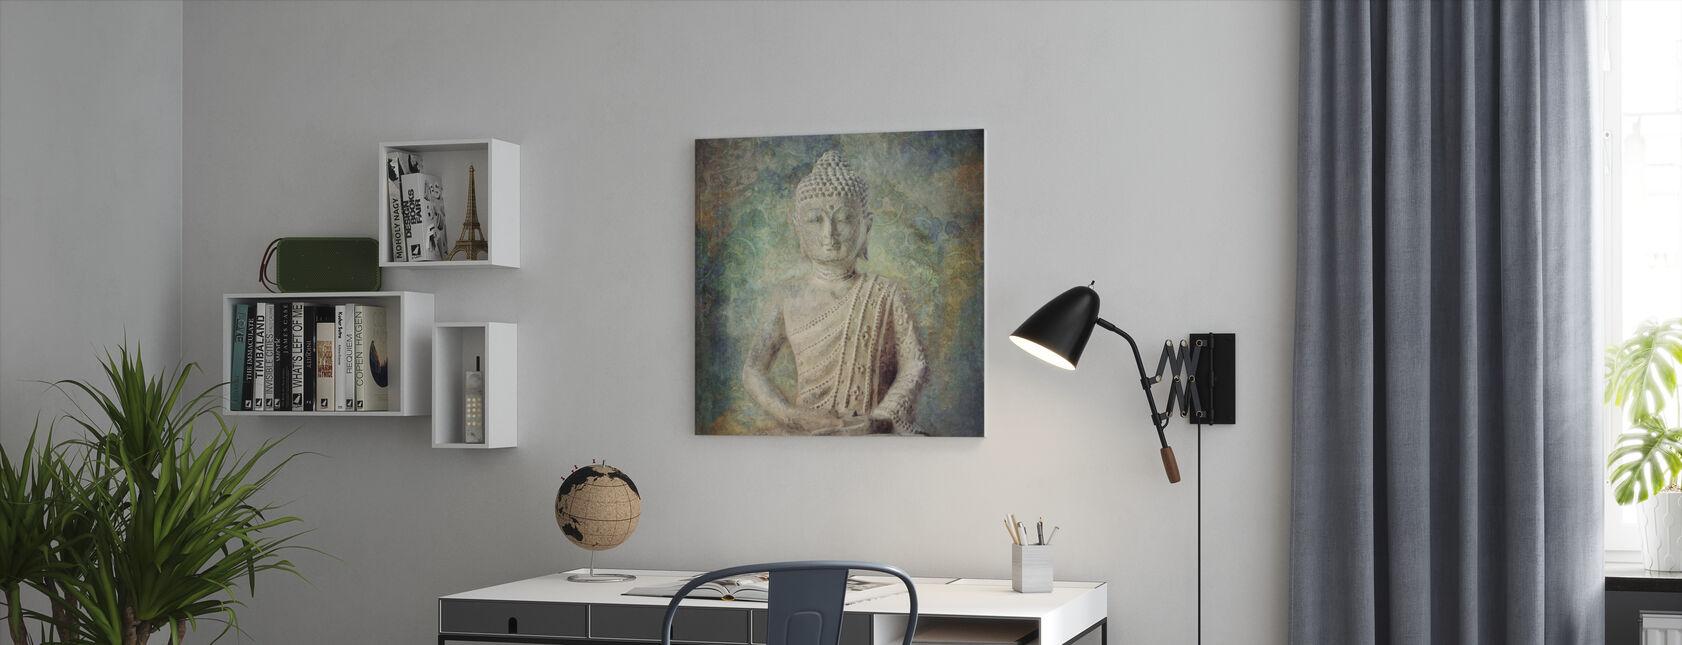 Rolig Buddha Squared - Lerretsbilde - Kontor